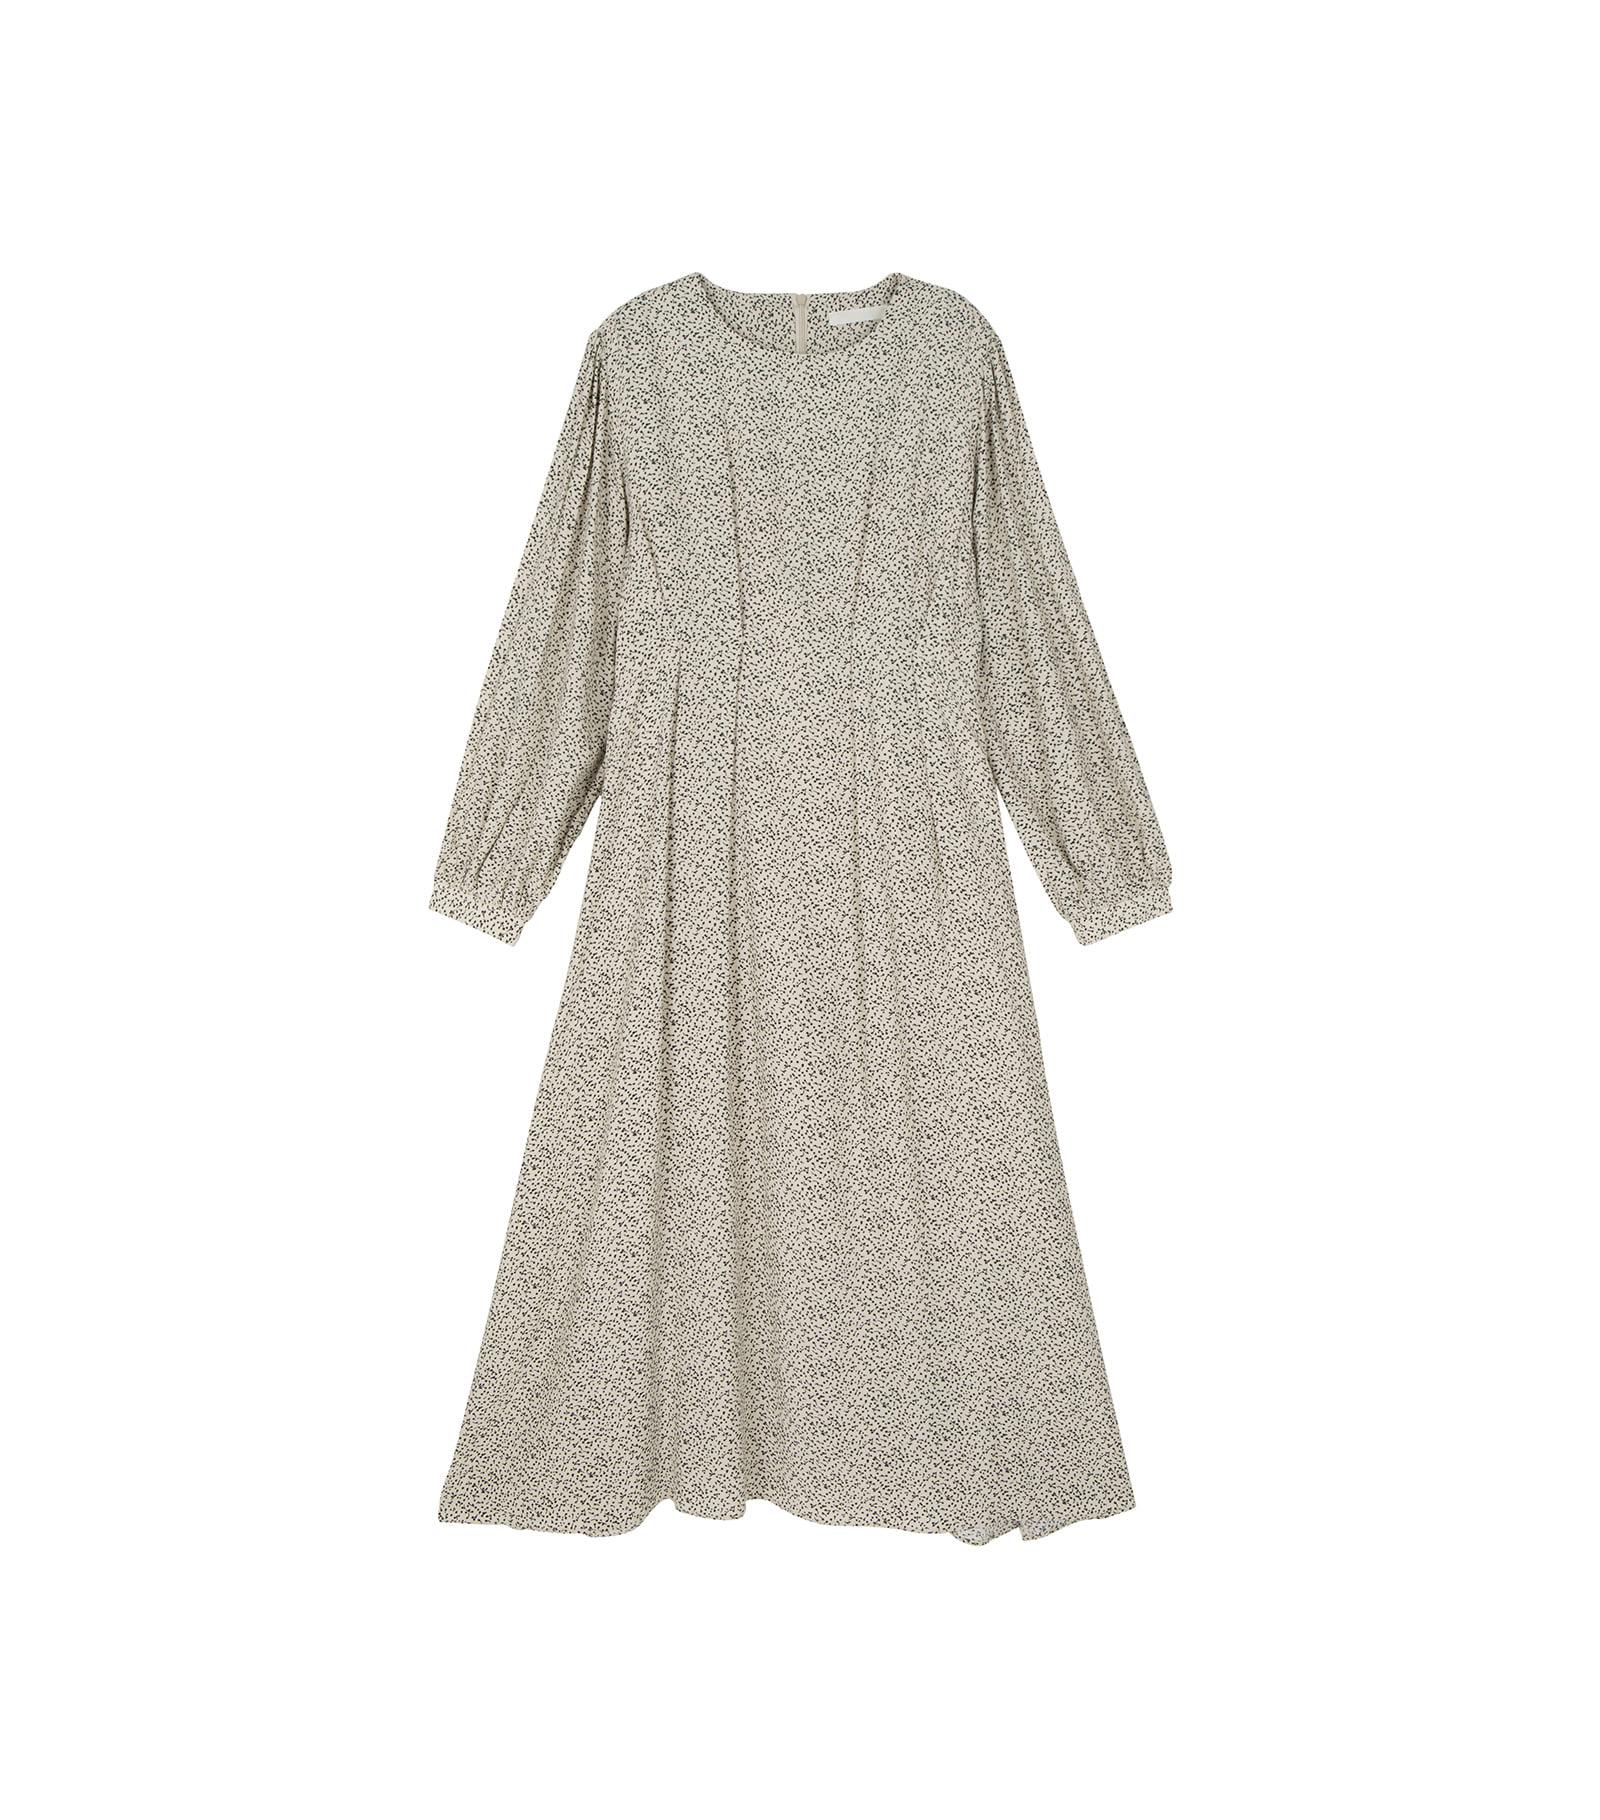 Cherry pattern midi dress